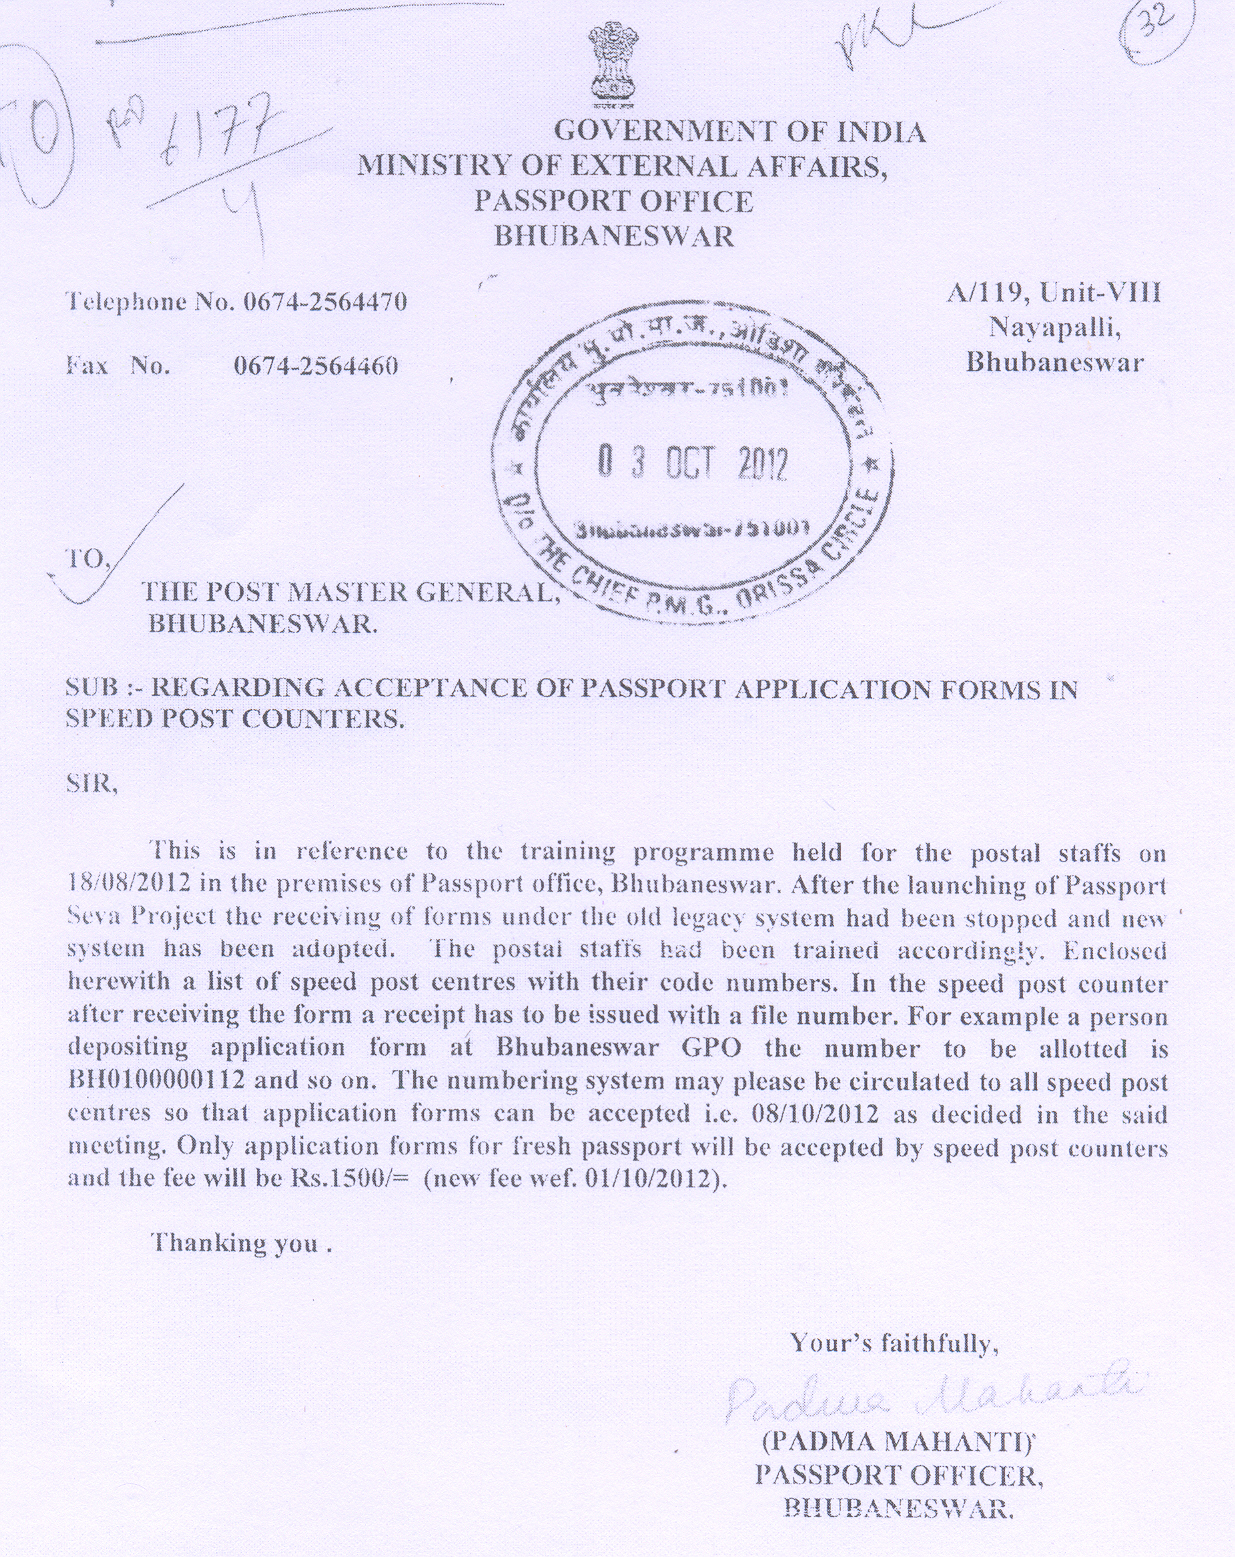 Aipeugr c bhubaneswar odisha acceptance of passport application the passport officer regional passport office bhubaneswar wrt letter a119 unit viii nayapalli bhubaneswar dtd nil falaconquin